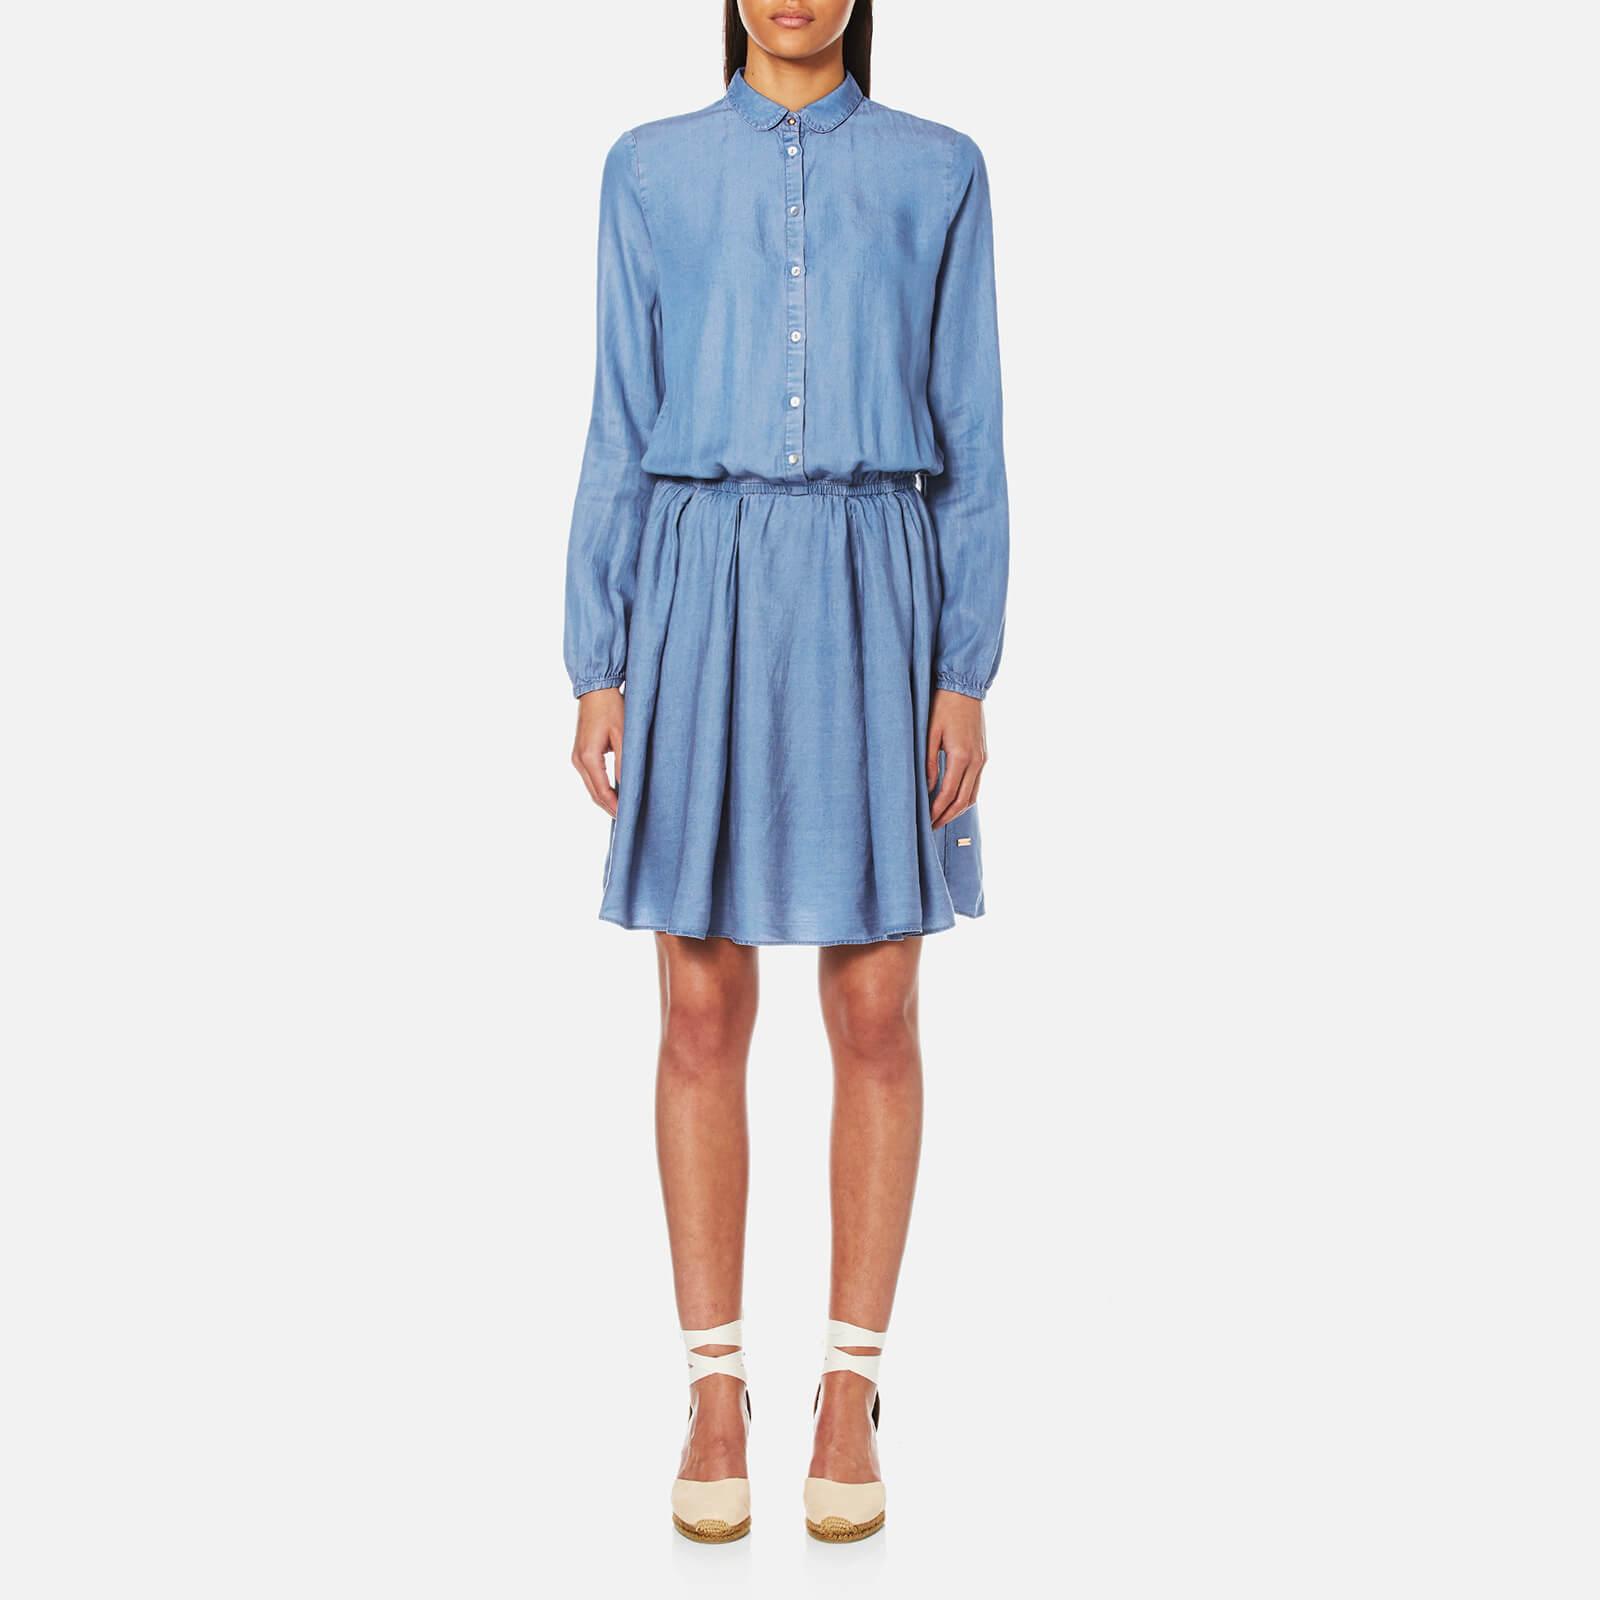 3fa446ce308d BOSS Orange Women s Clace Dress - Open Blue - Free UK Delivery over £50